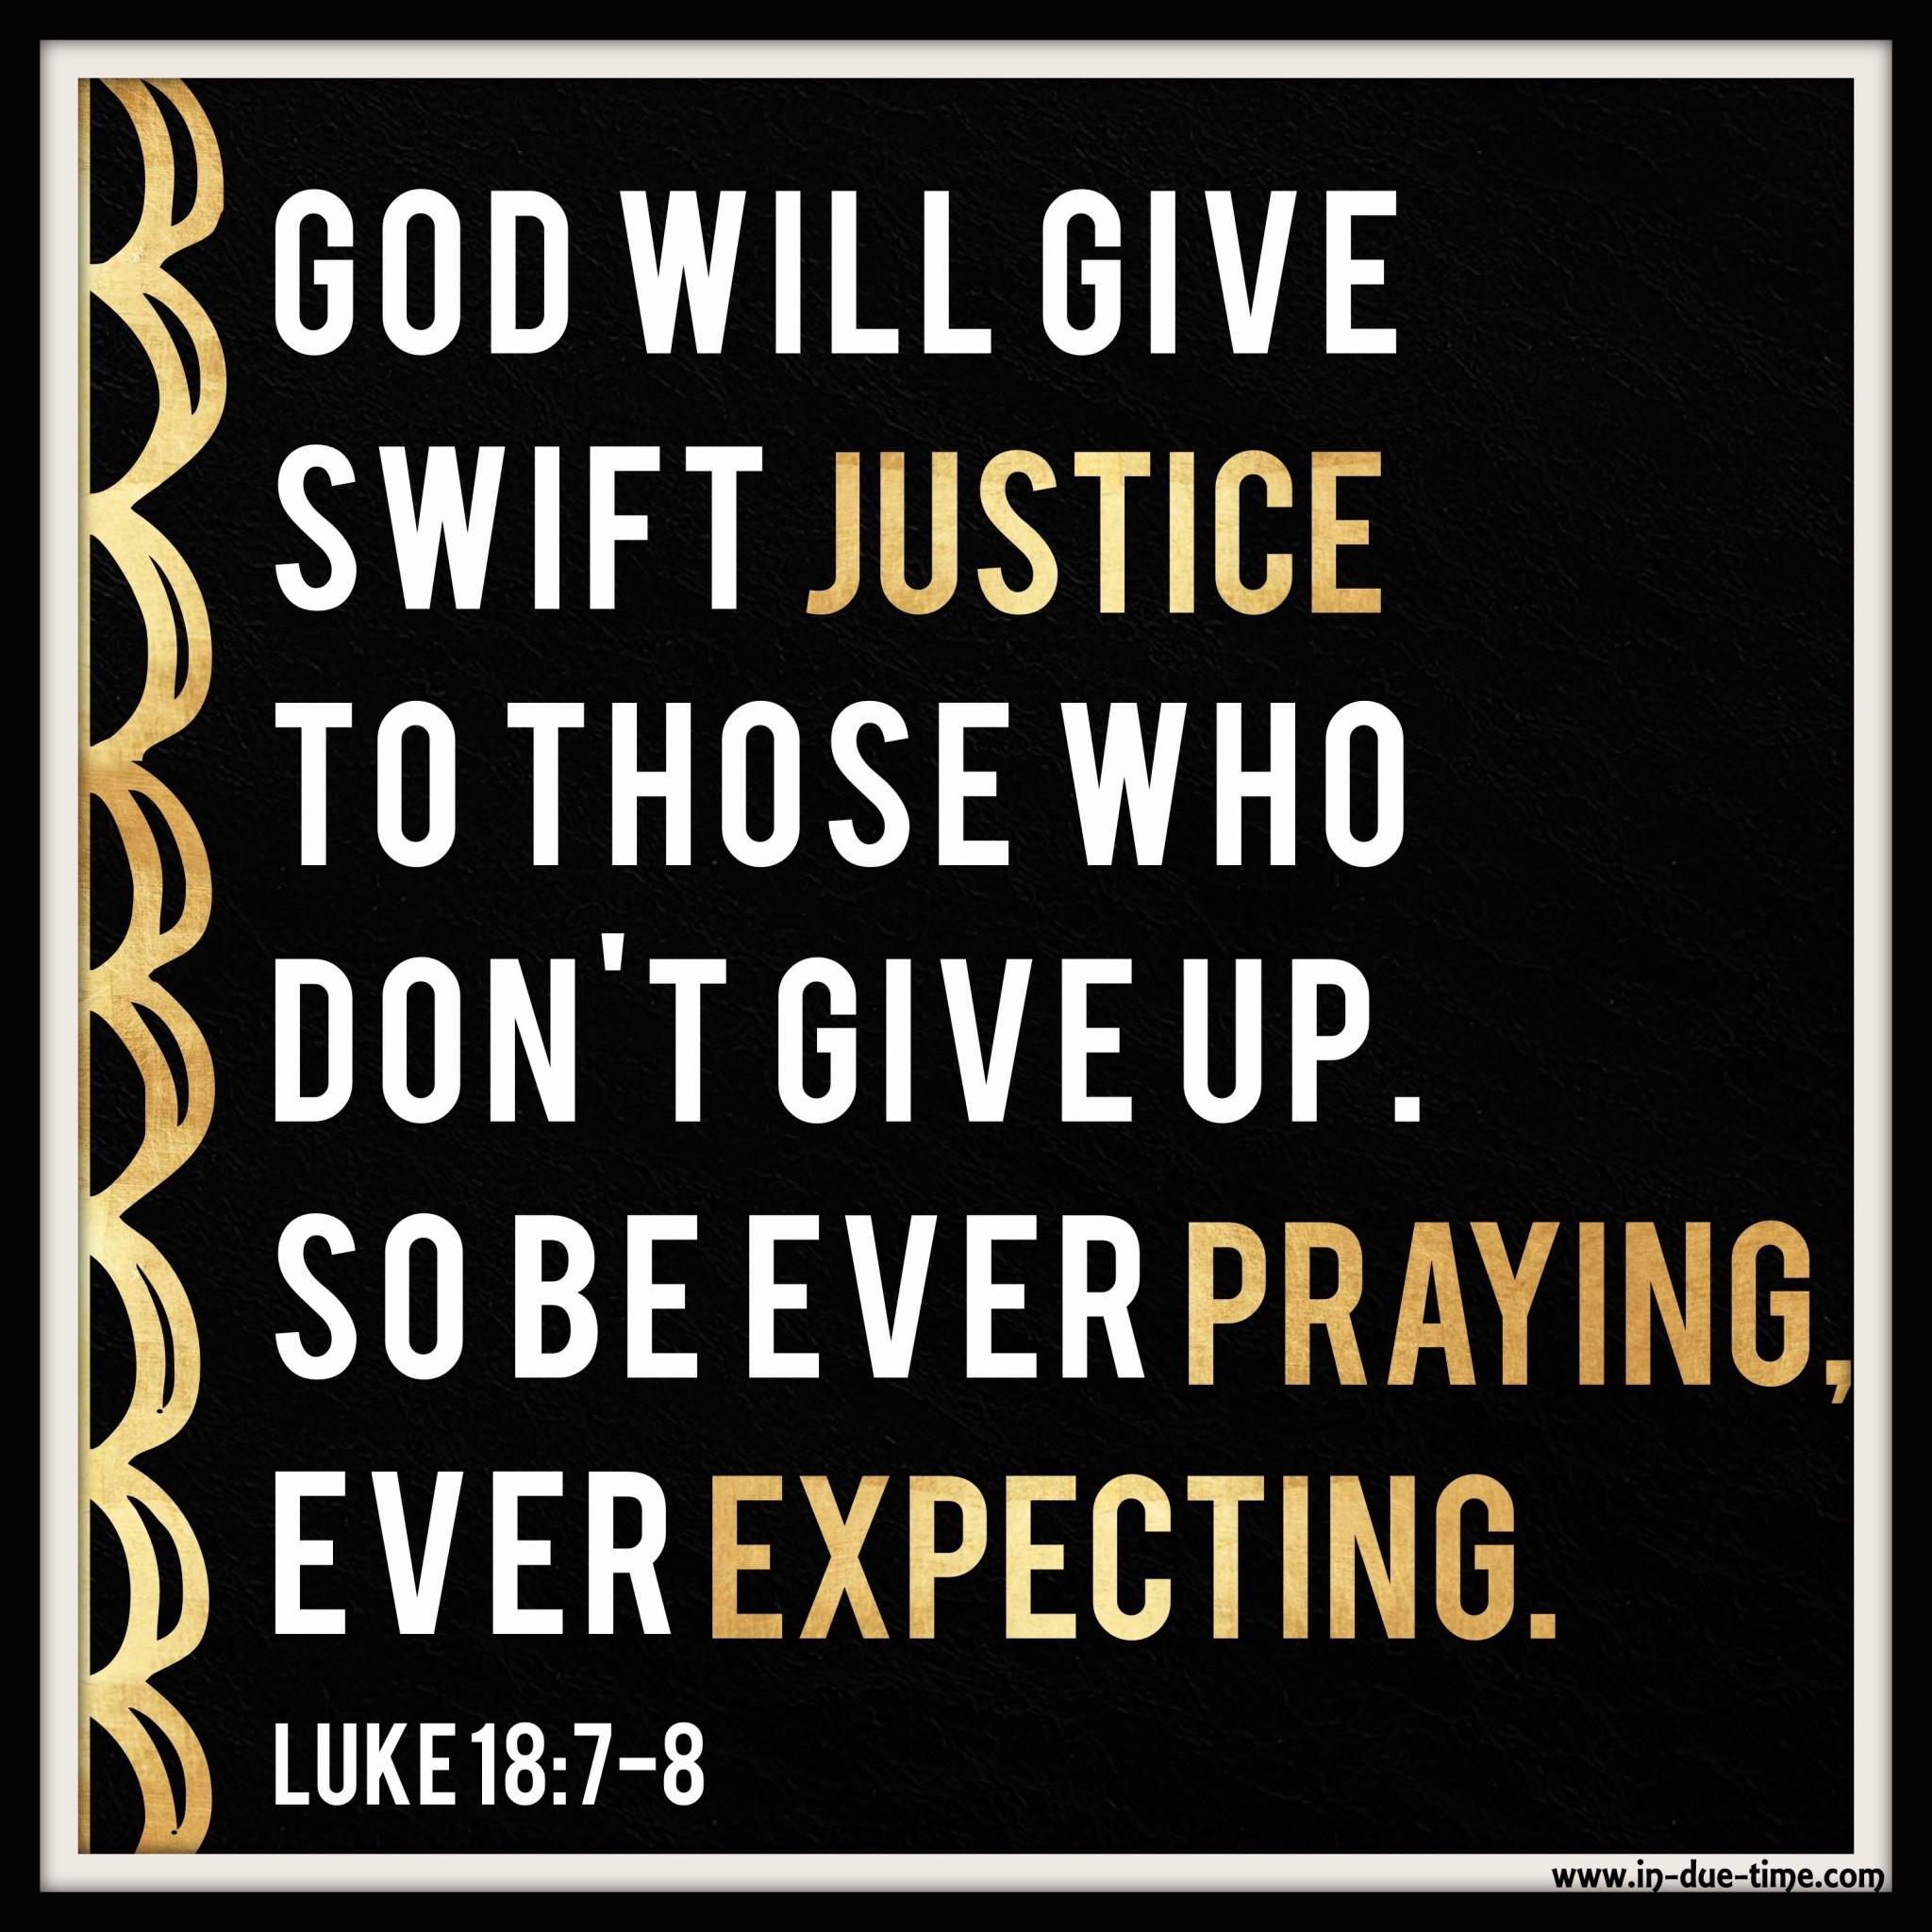 Daily Bible Reading: Luke 18:1-17